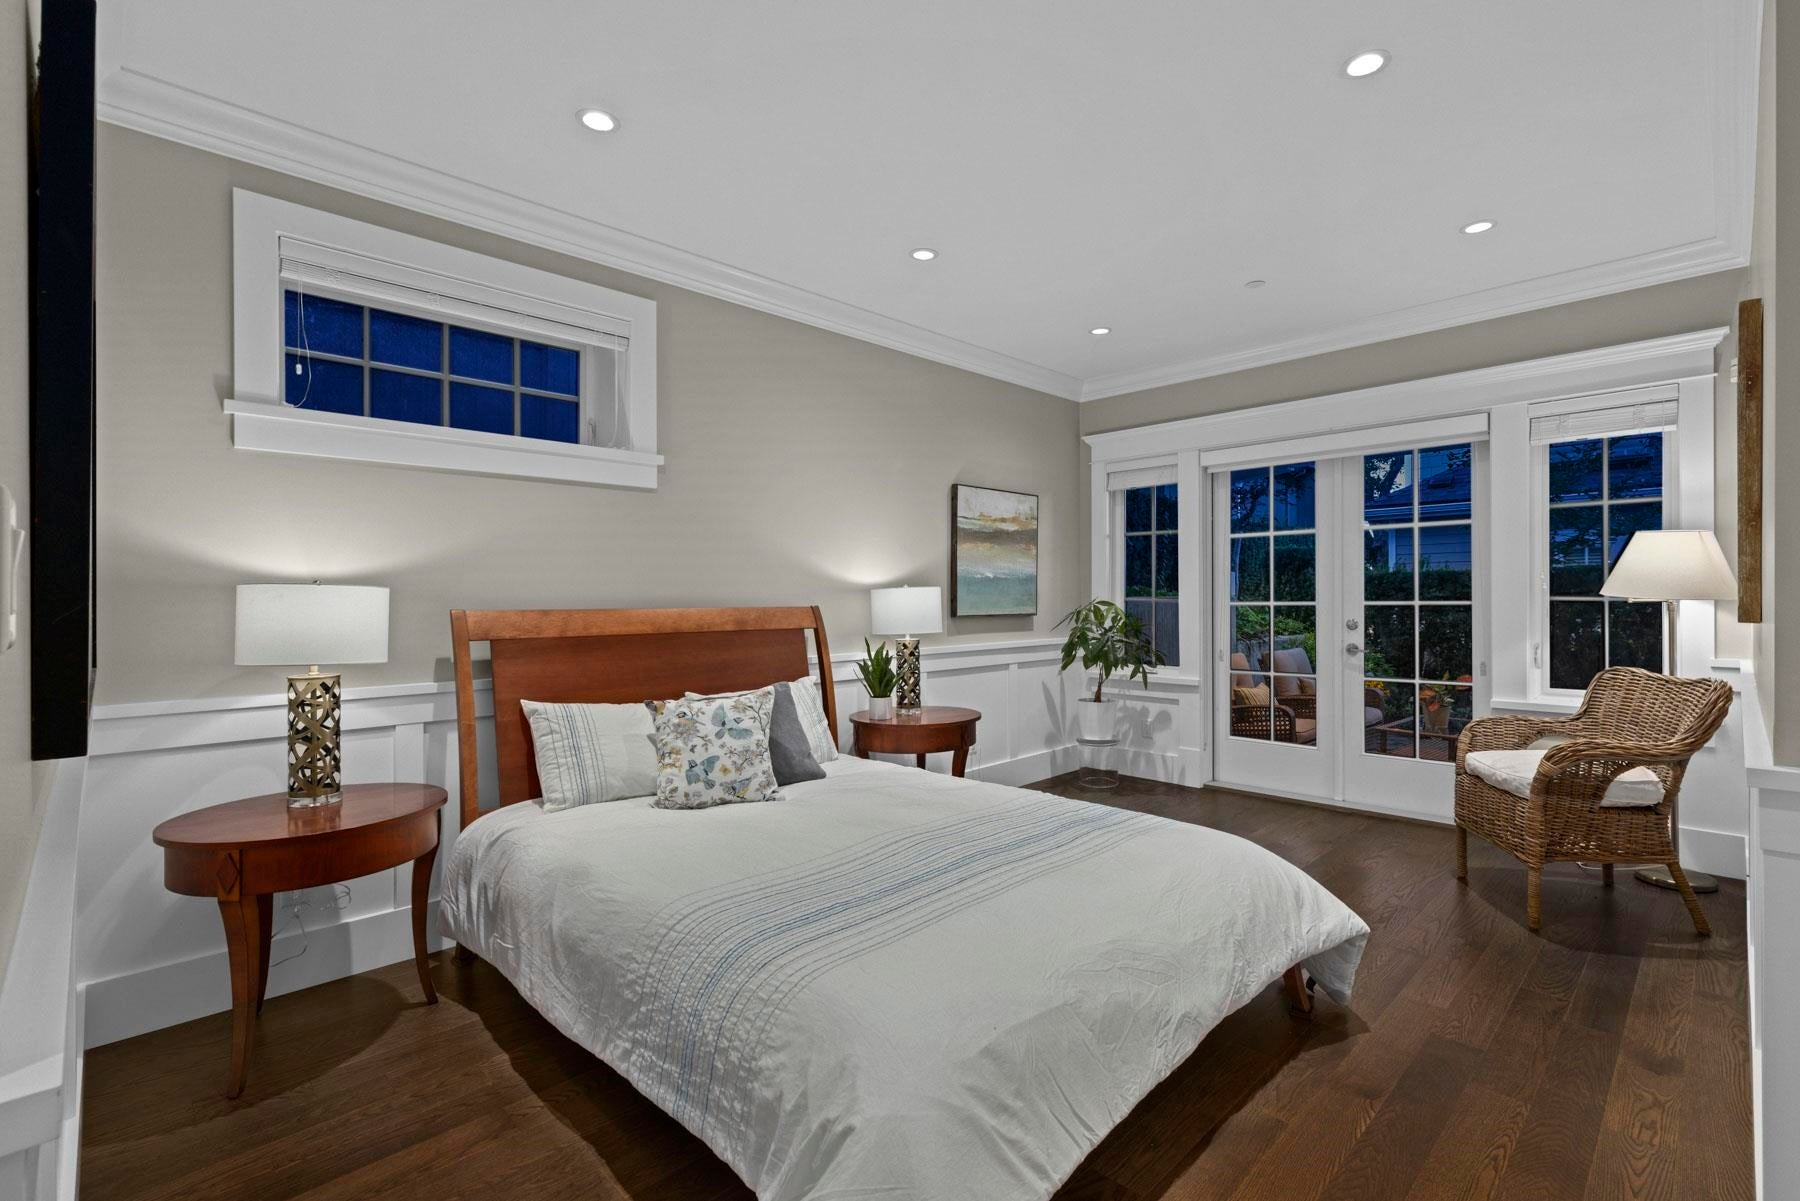 1421 GORDON AVENUE - Ambleside House/Single Family for sale, 3 Bedrooms (R2617756) - #18